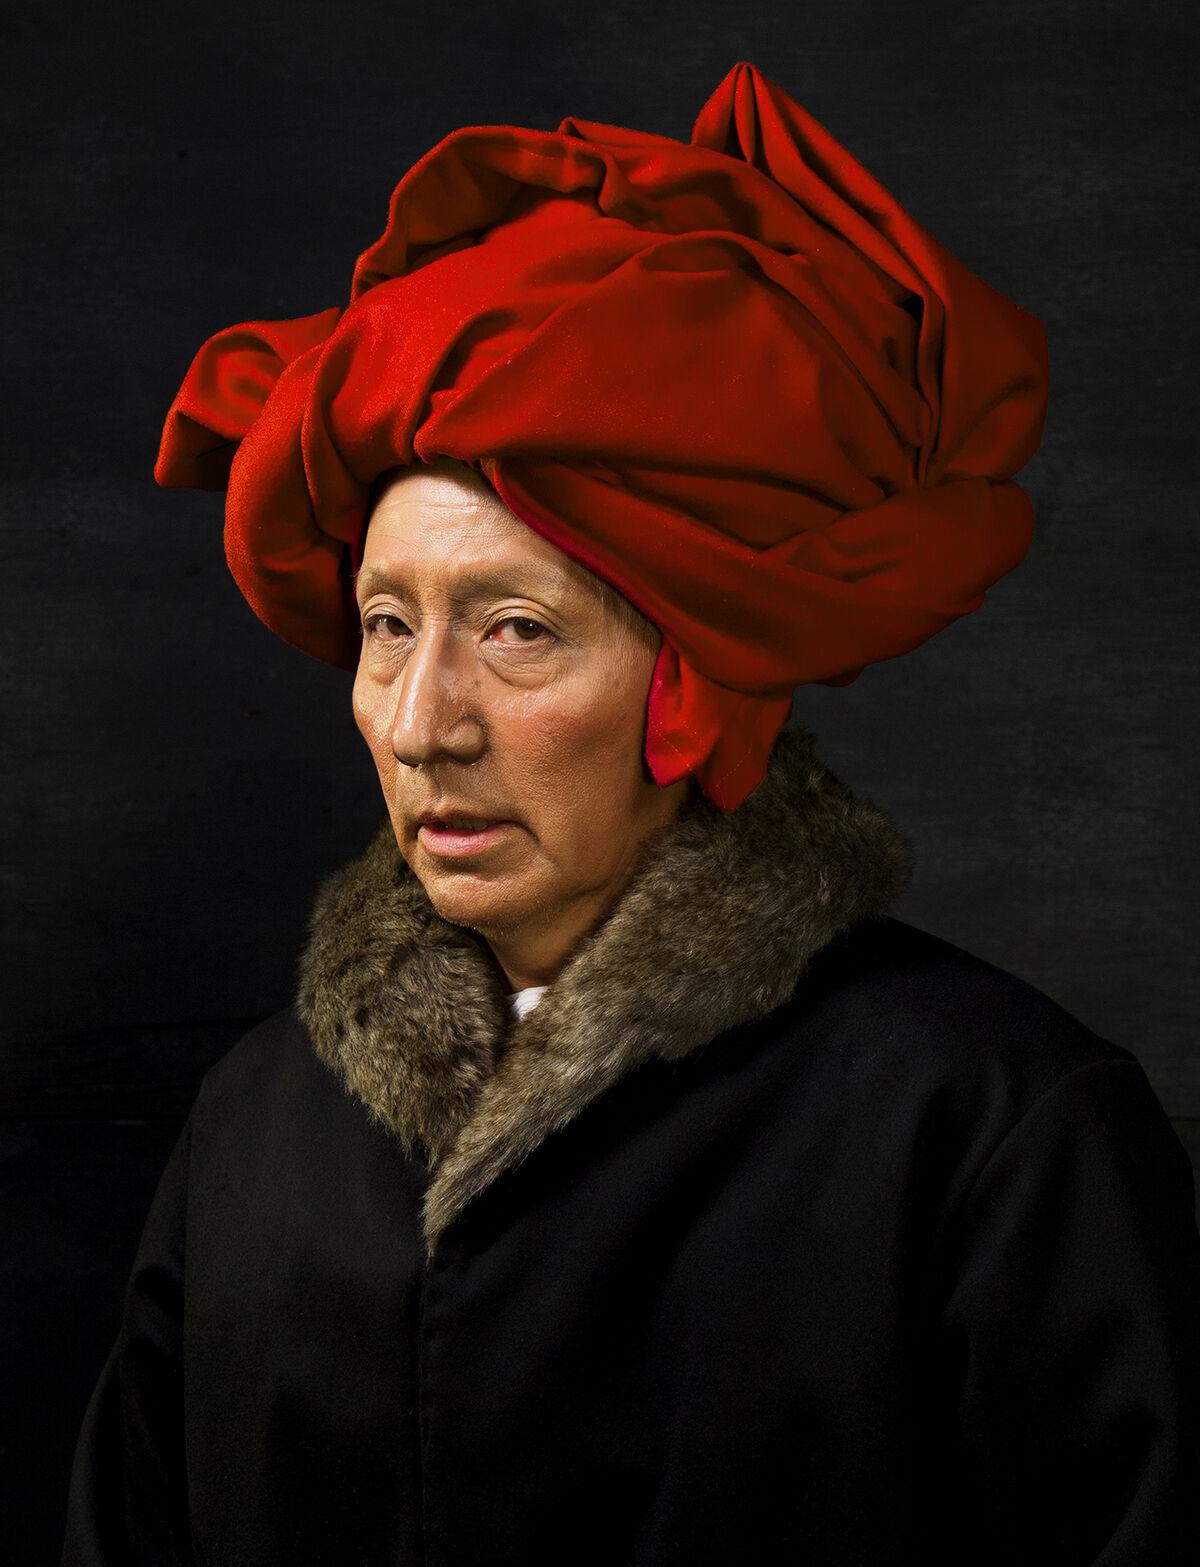 Yasumasa Morimura, Self-Portraits through Art History (Van Eyck in a Red Turban), 2016. © Yasumasa Morimura. Courtesy of the artist and Luhring Augustine, New York.